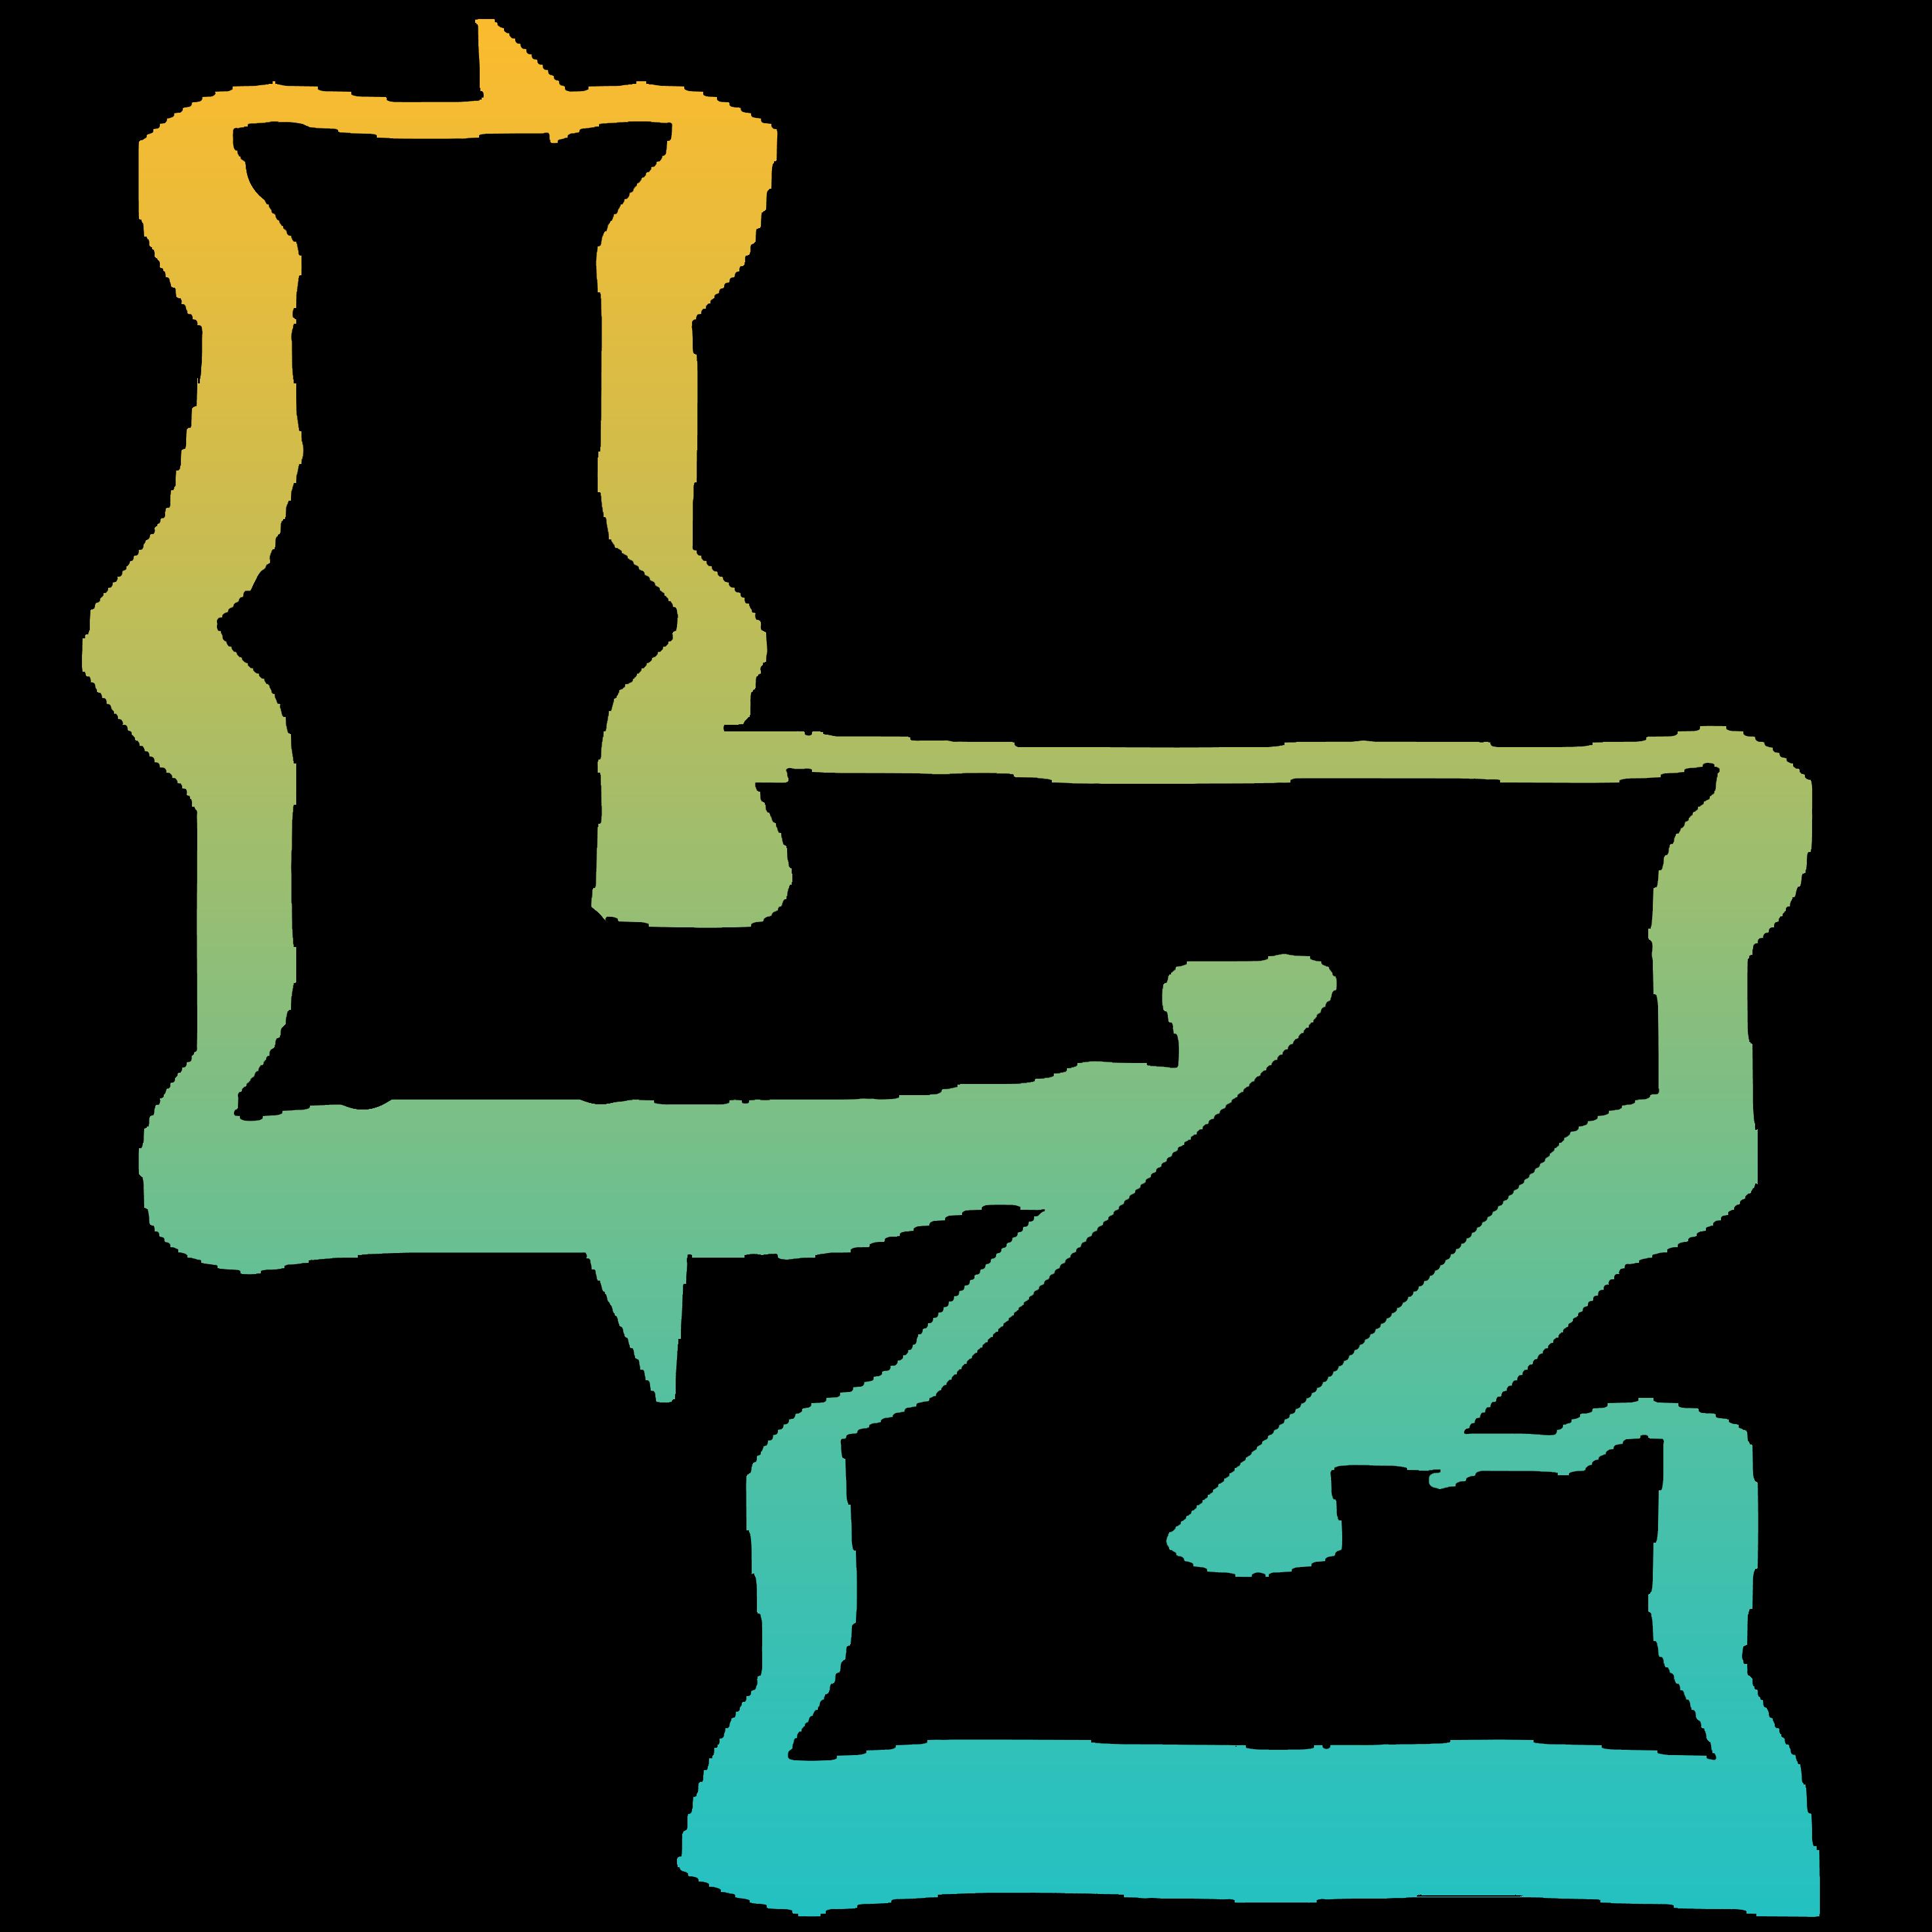 baronzombz